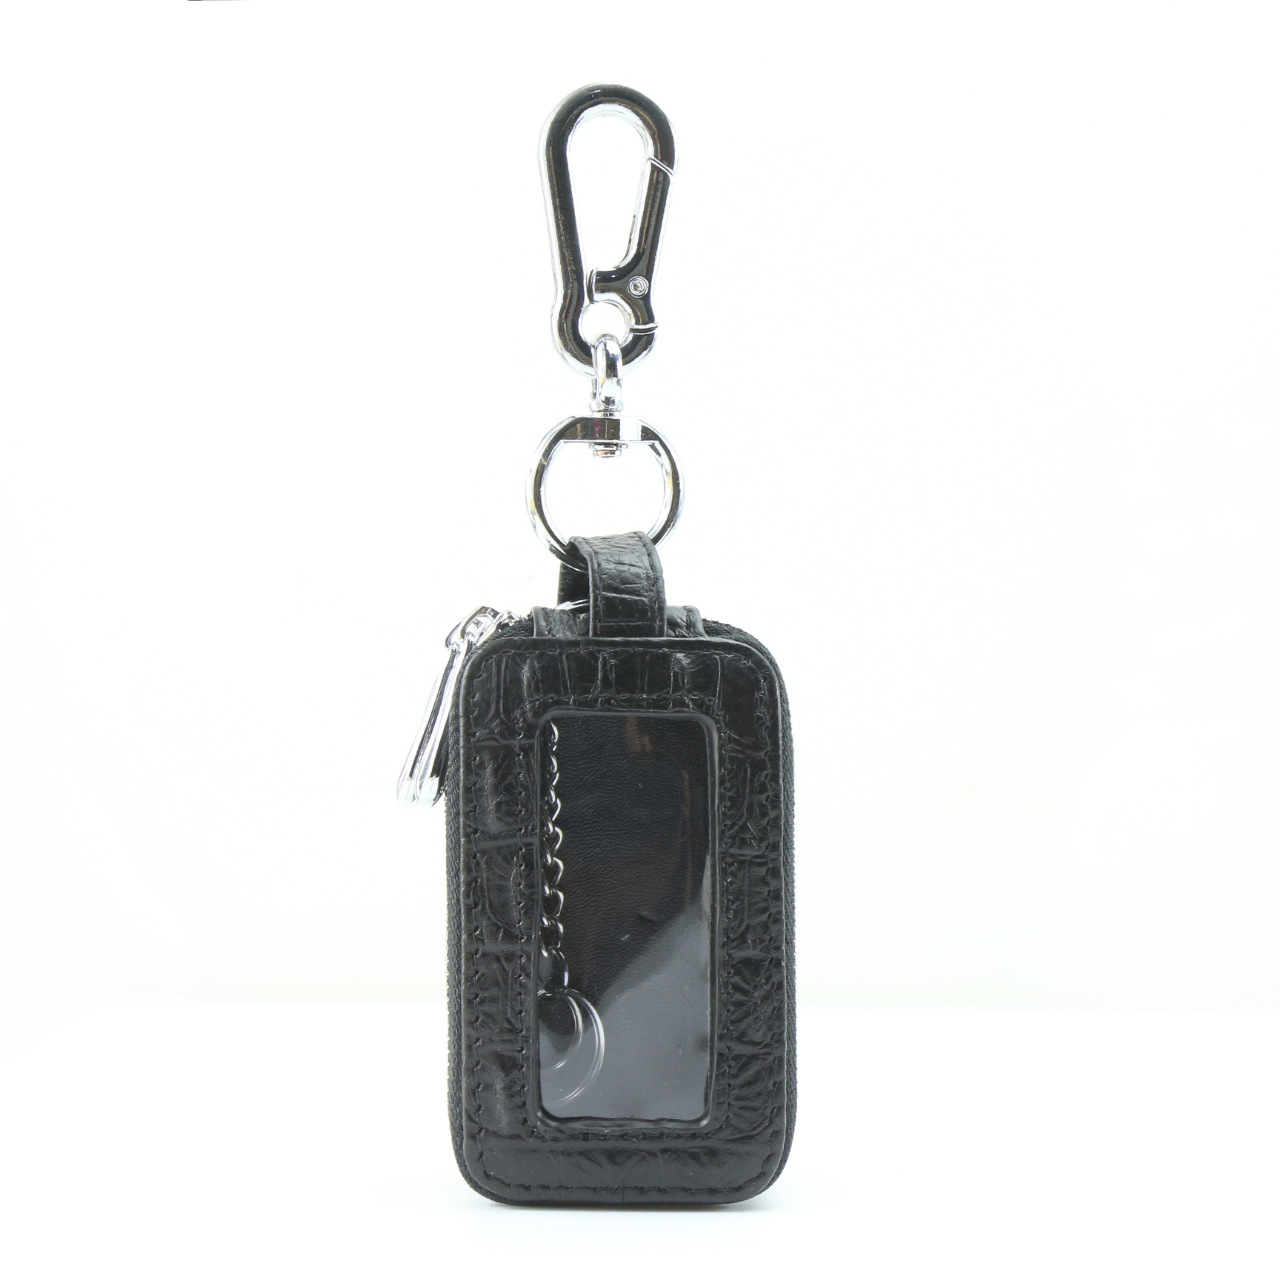 Fashion Crocodile Pattern Key Bag Leather Men and Women Wallet Car Key Bag Key Ring Large Capacity Storage Bag Small Wallet